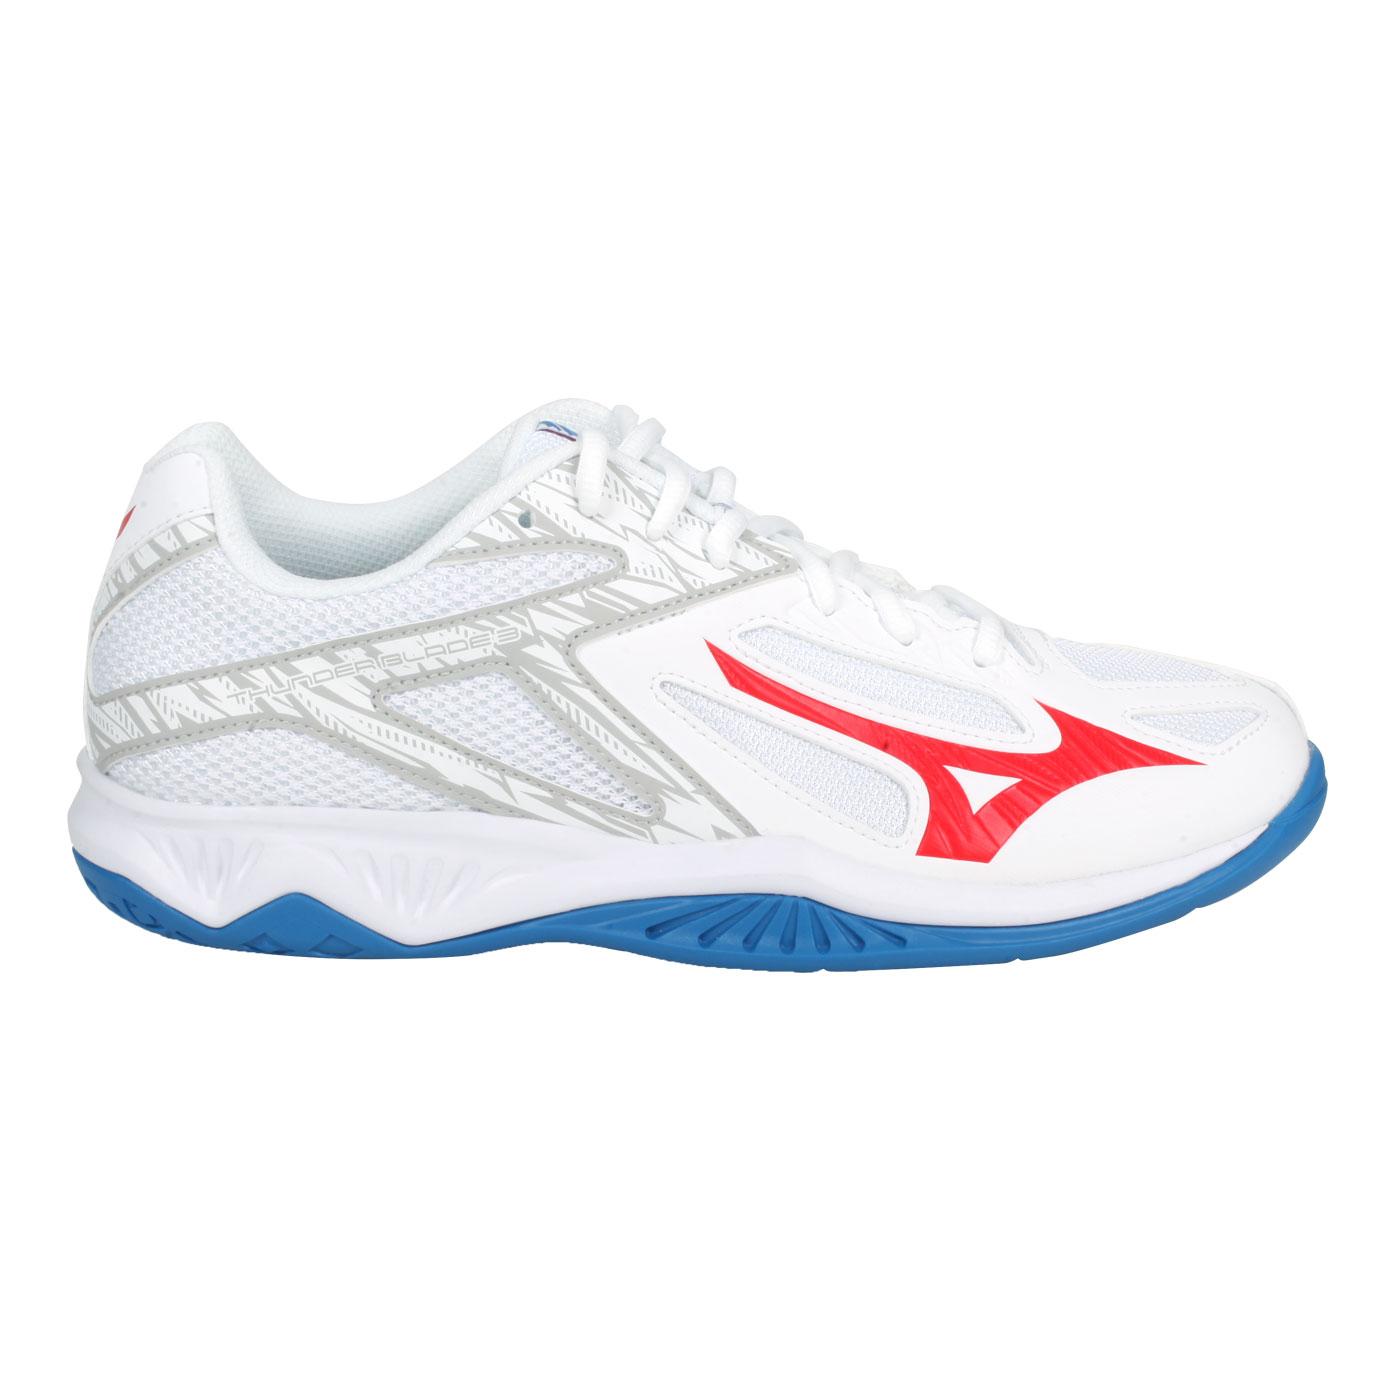 MIZUNO 排球鞋  @THUNDER BLADE 3@V1GA217025 - 白紅藍